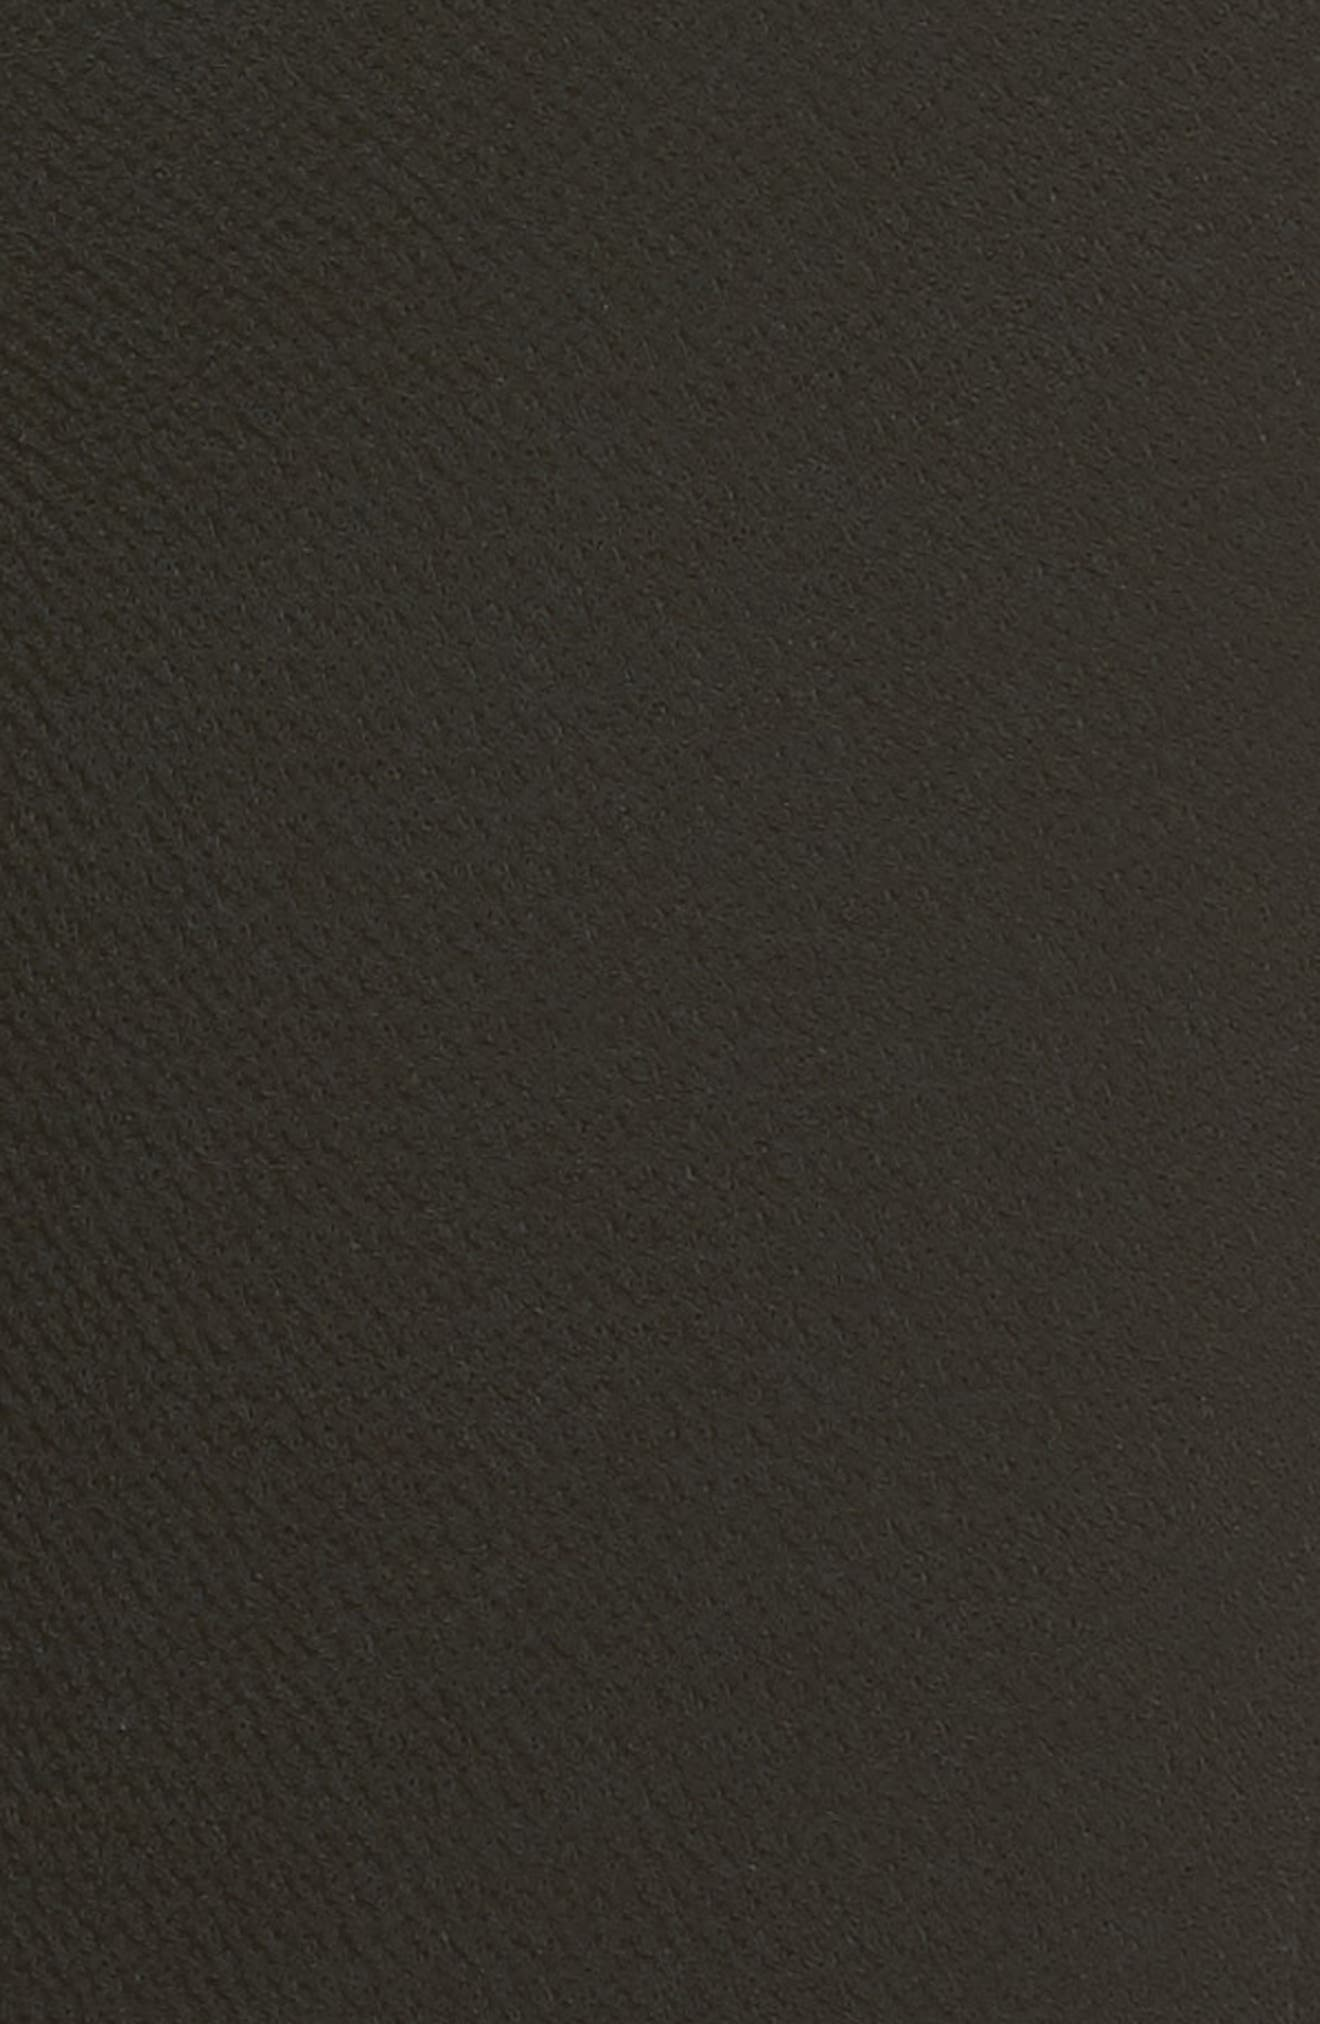 Atestelito Slim Crepe Suit Pants,                             Alternate thumbnail 5, color,                             Black